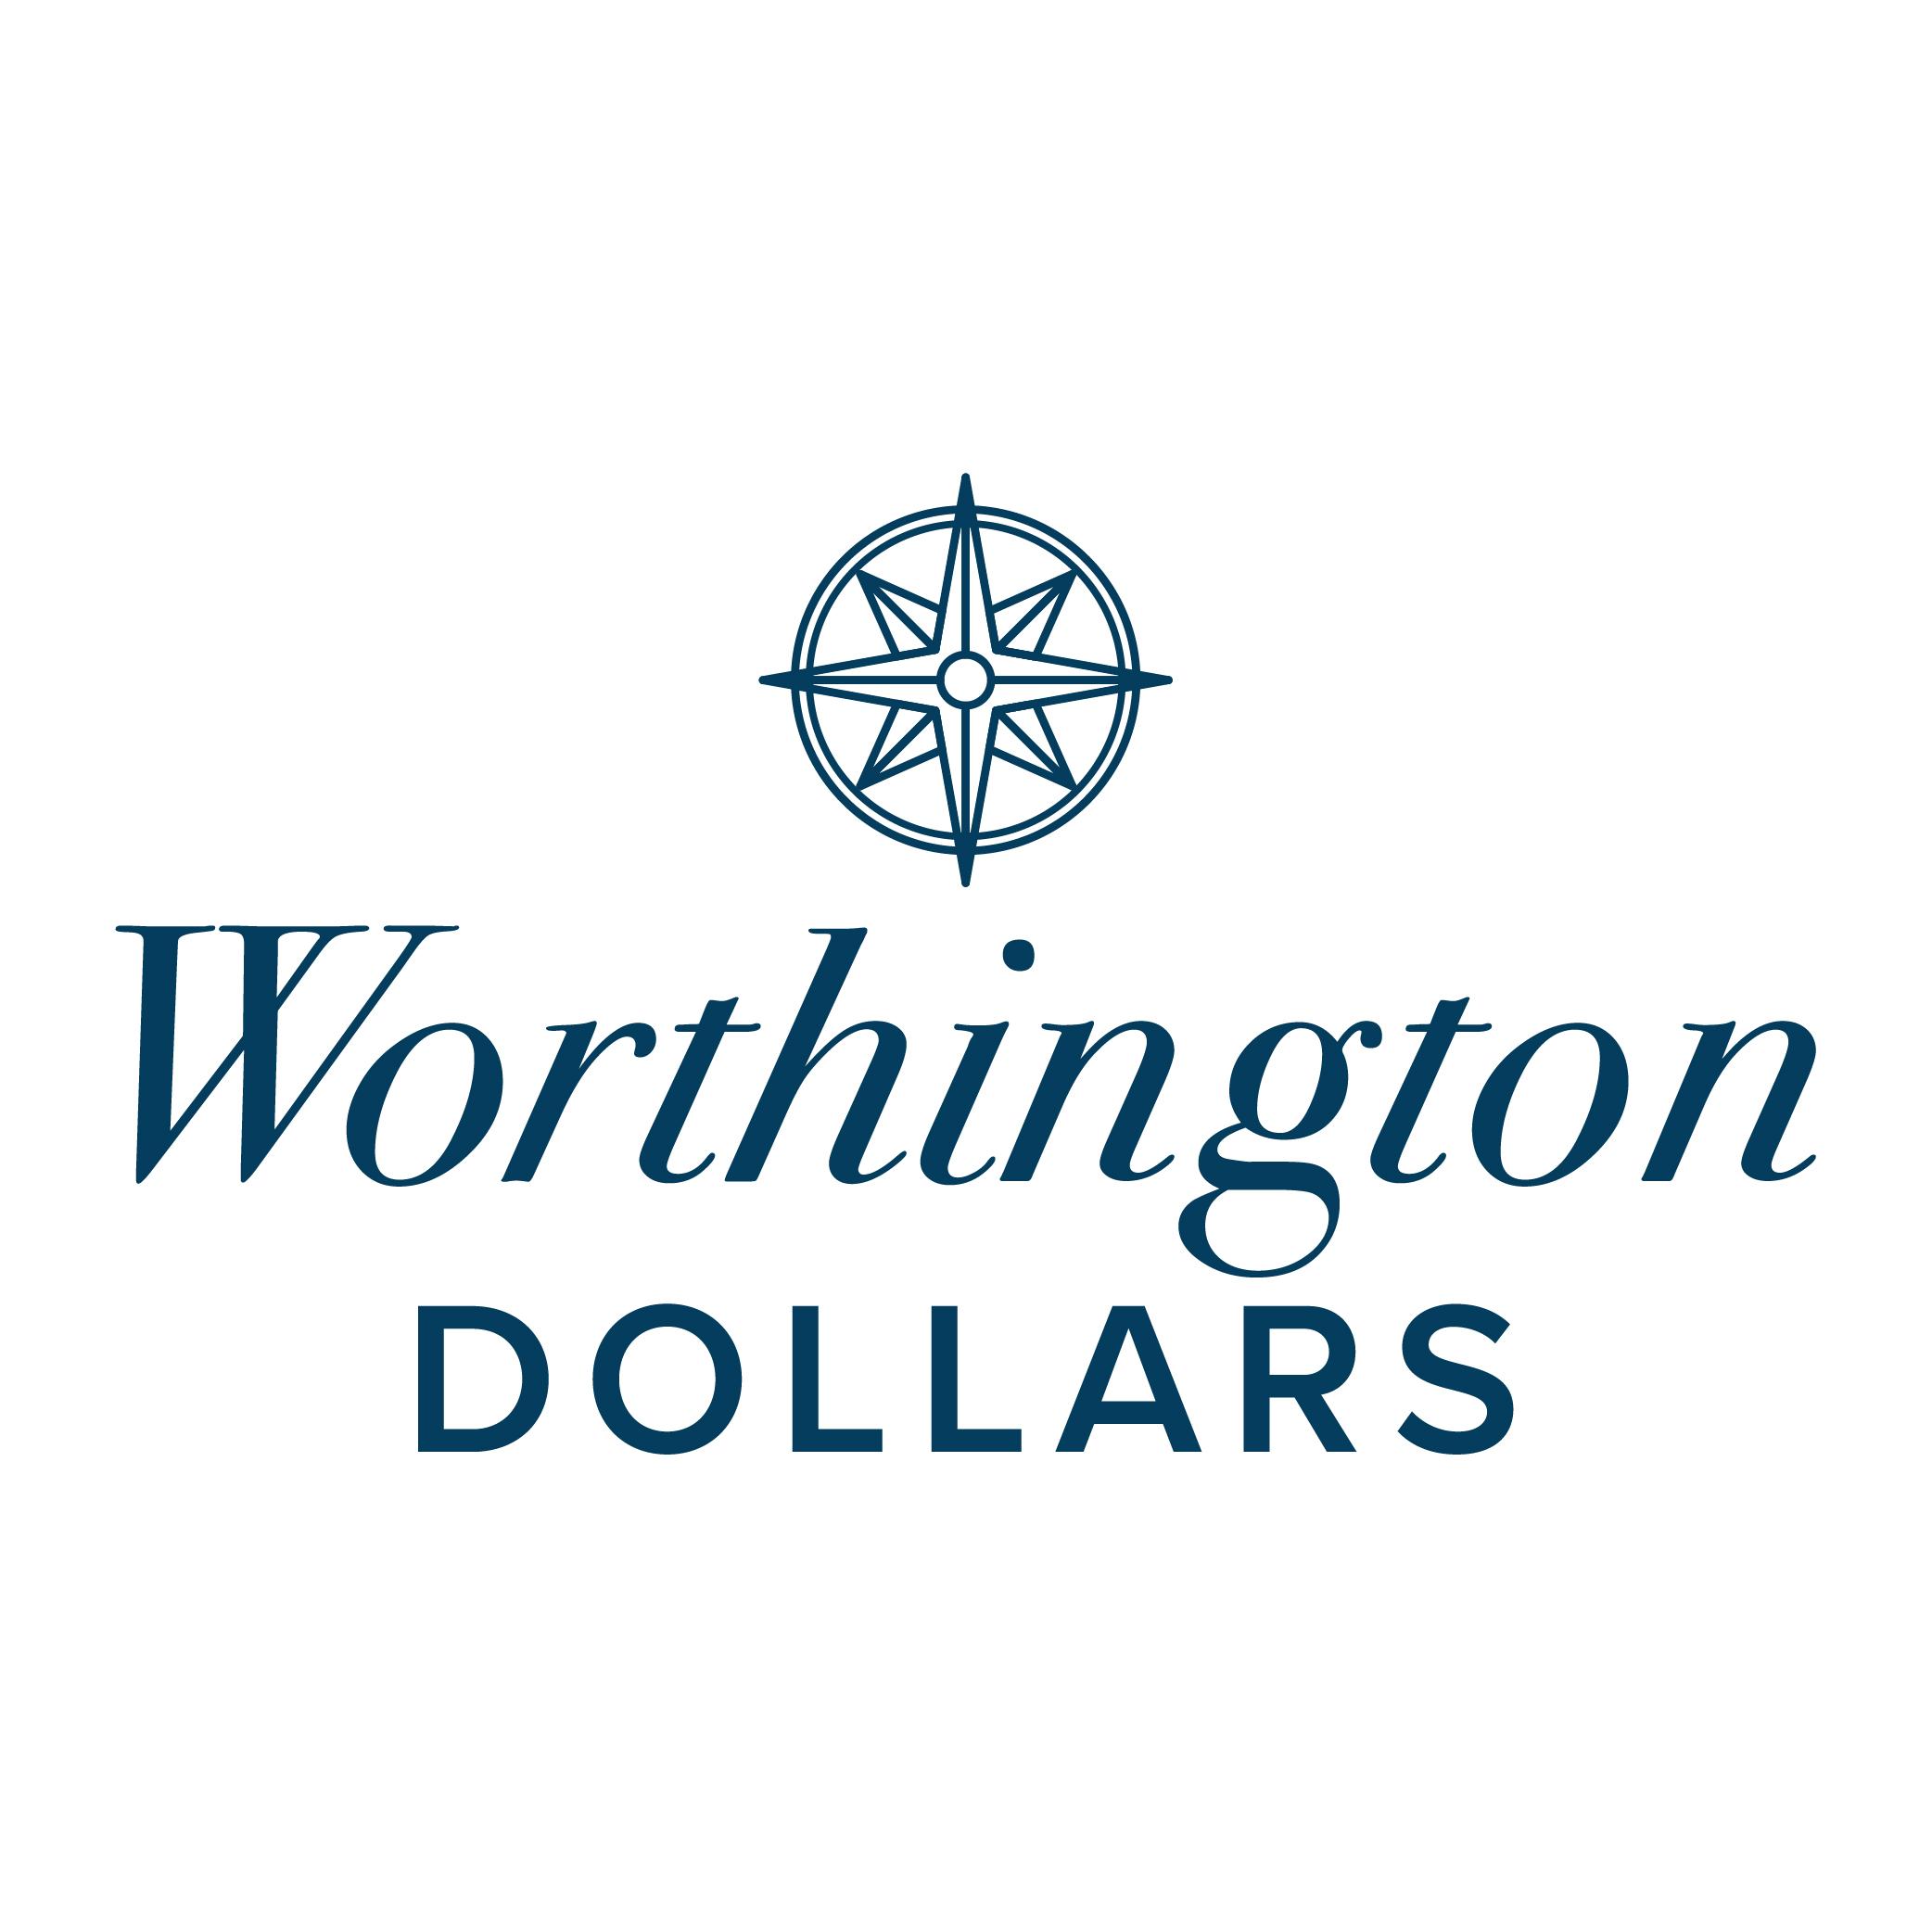 Worthington Dollars logo